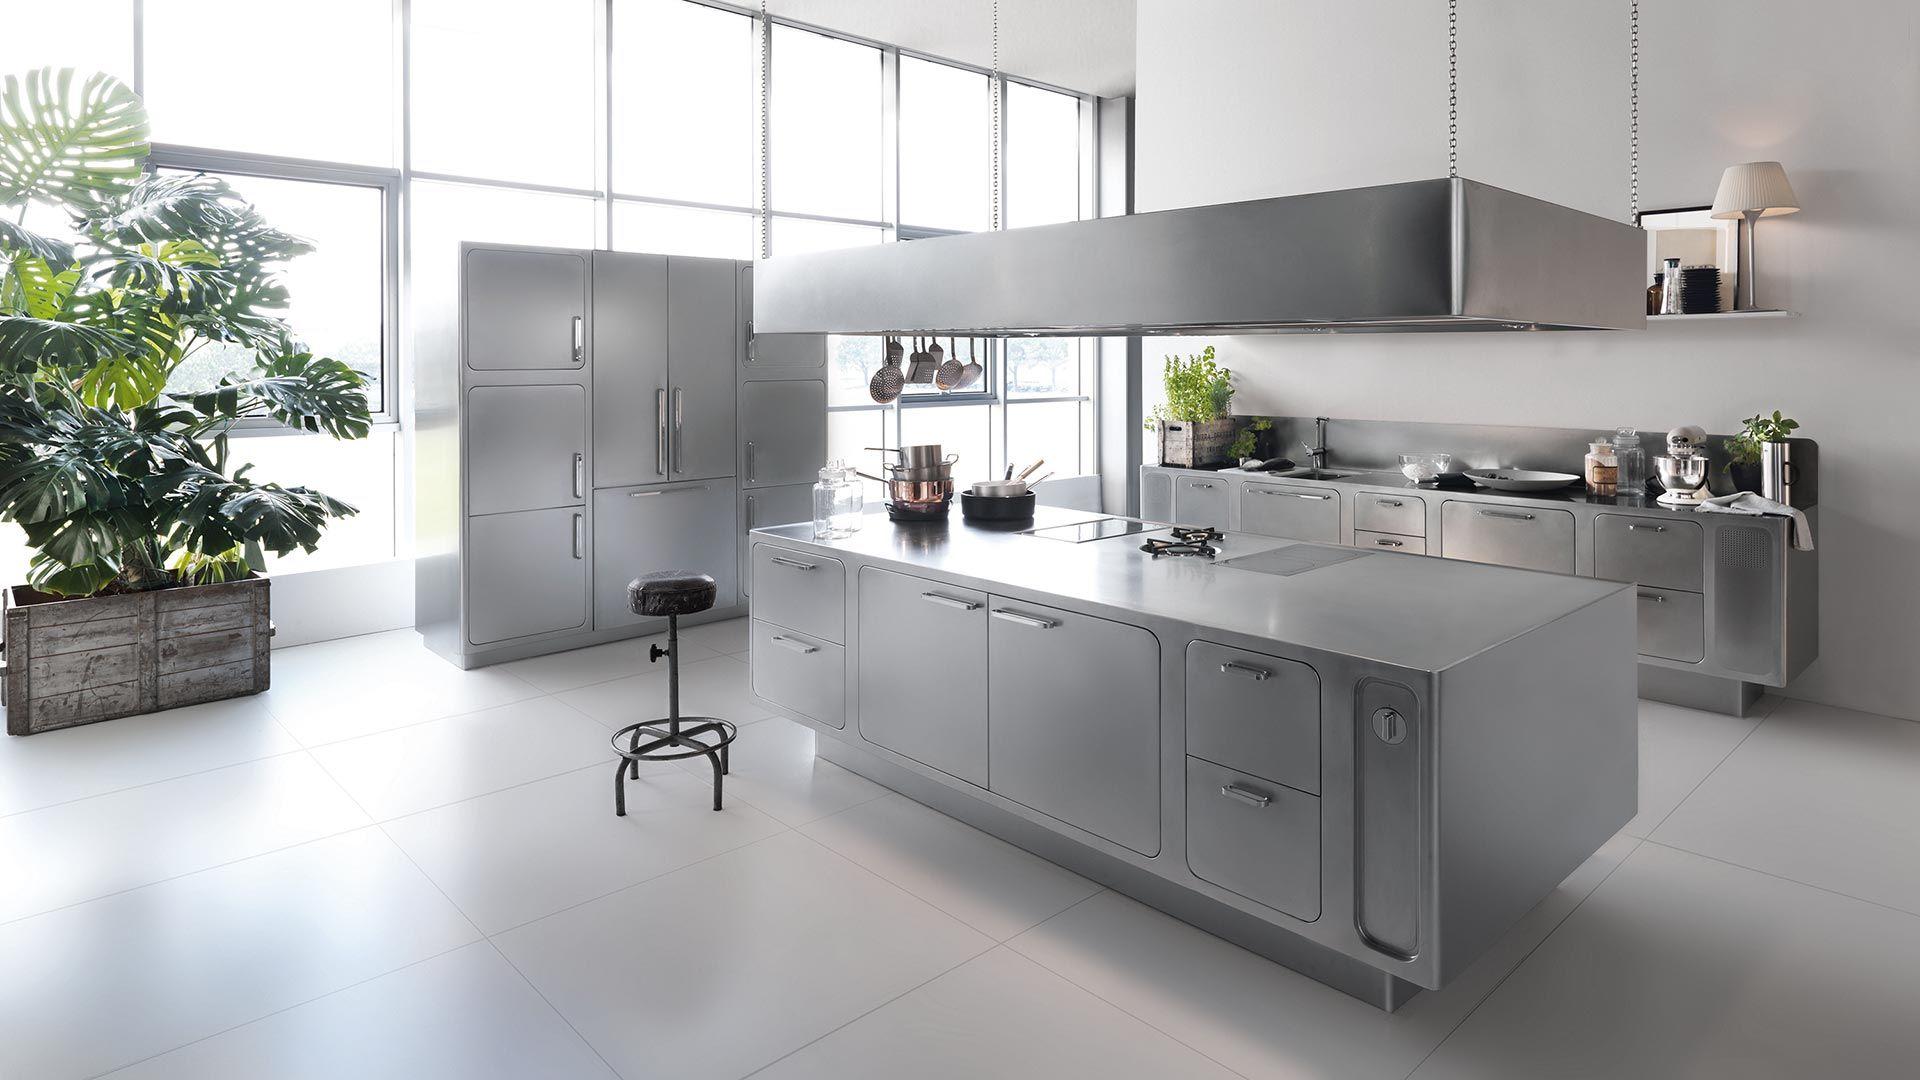 La cucina di design Ego   Kitchen   Pinterest